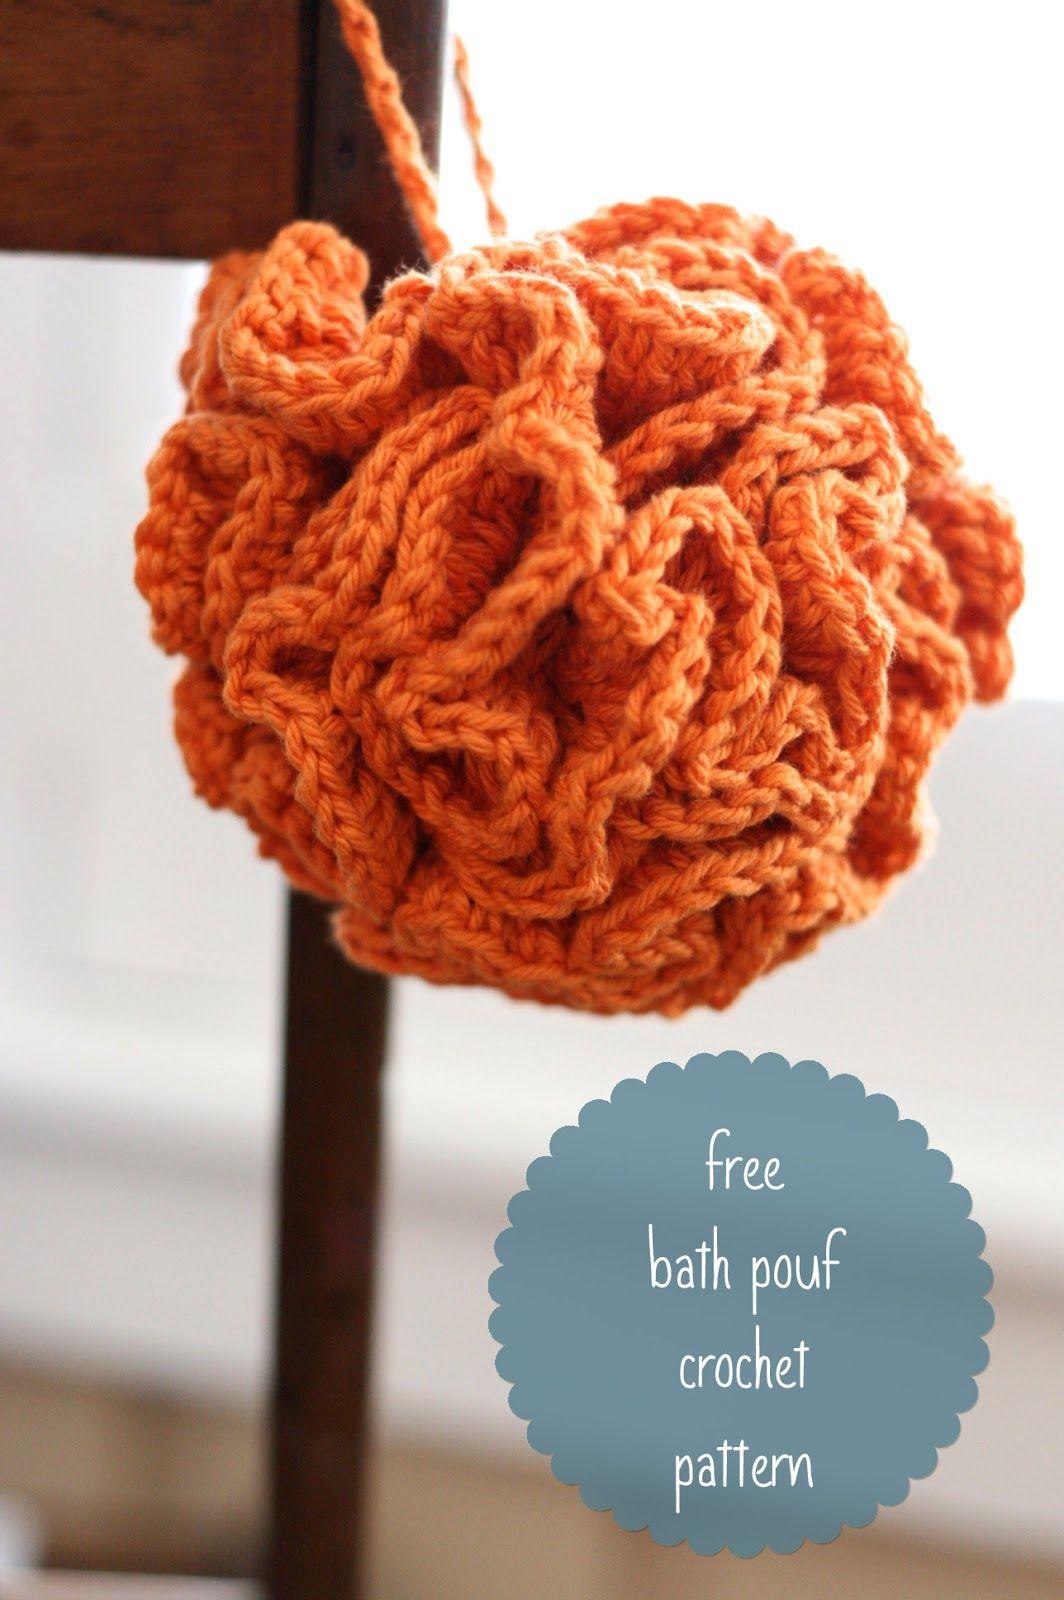 Bath Pouf Crochet Pattern | Tejido, Ganchillo y Trapillo